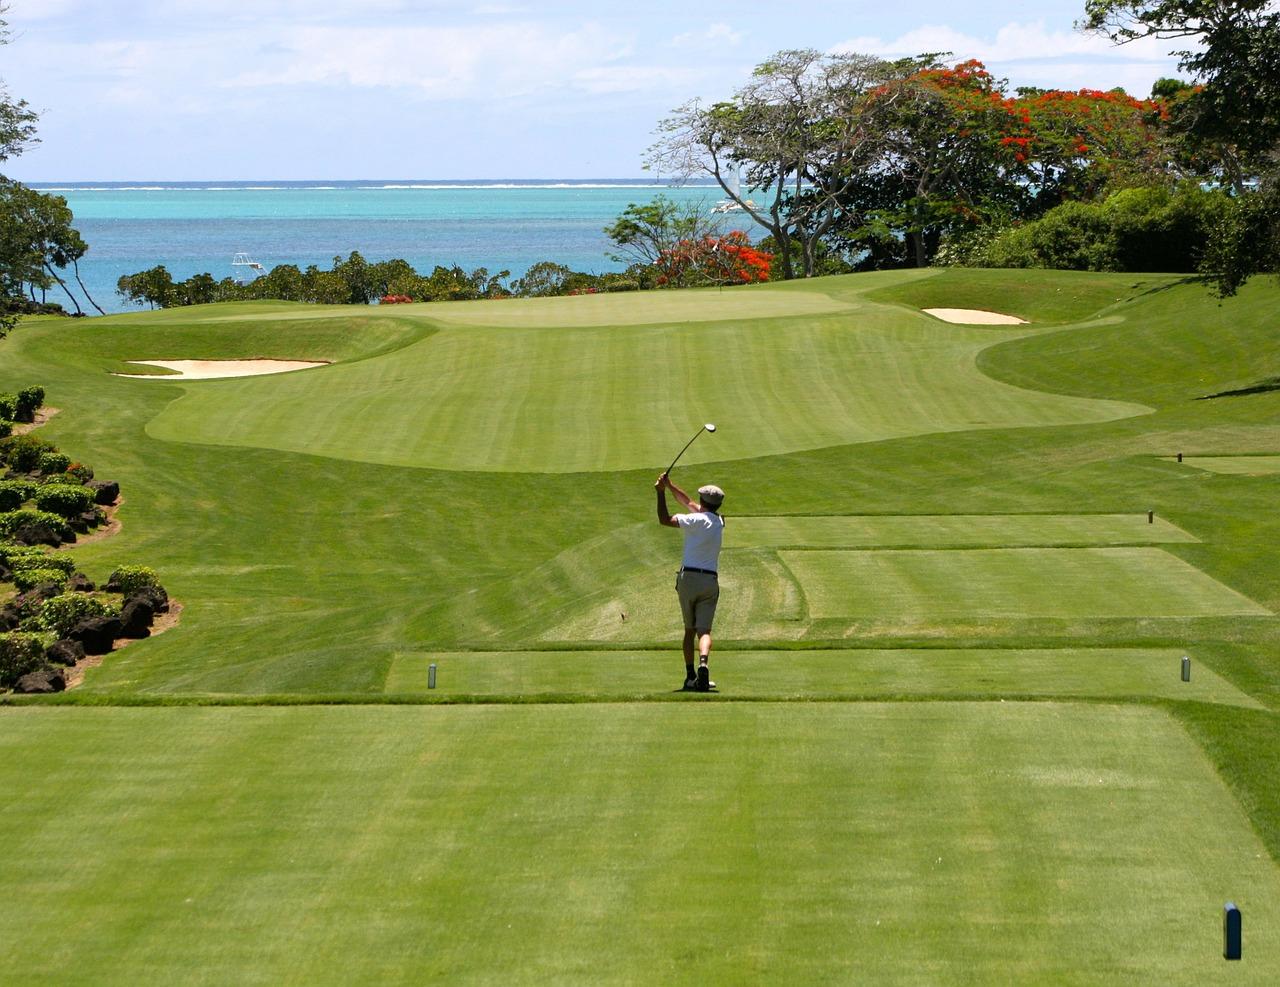 golf-83878_1280